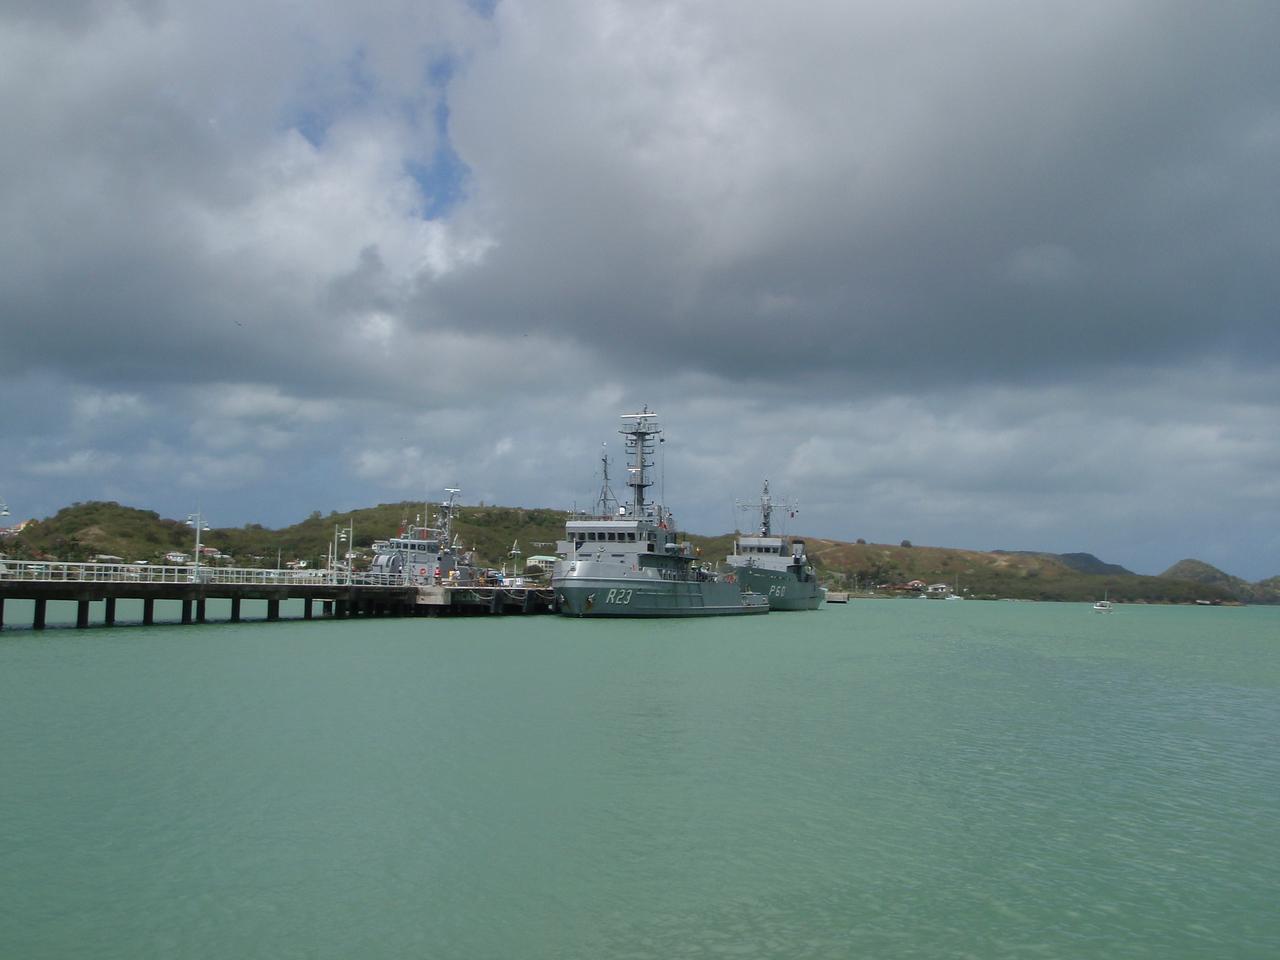 The Antiguan Navy?